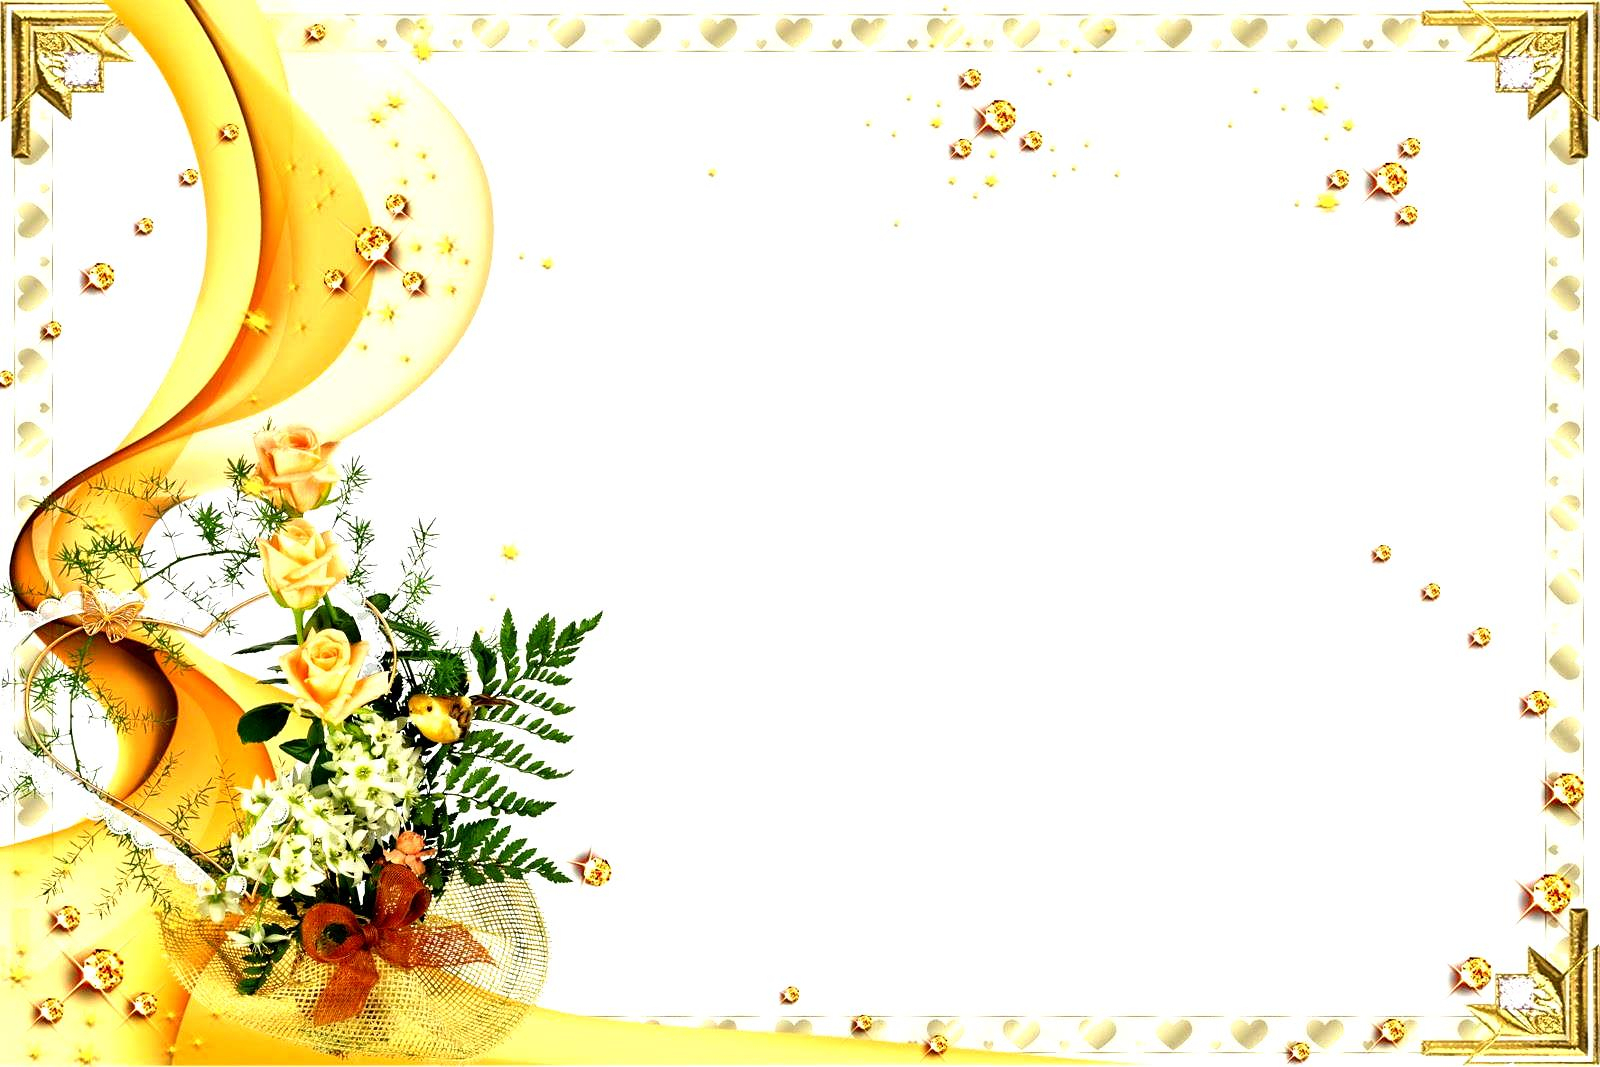 Printable Blank Invitation Templates | Free Invitation Templates - Printable Invitation Templates Free Download